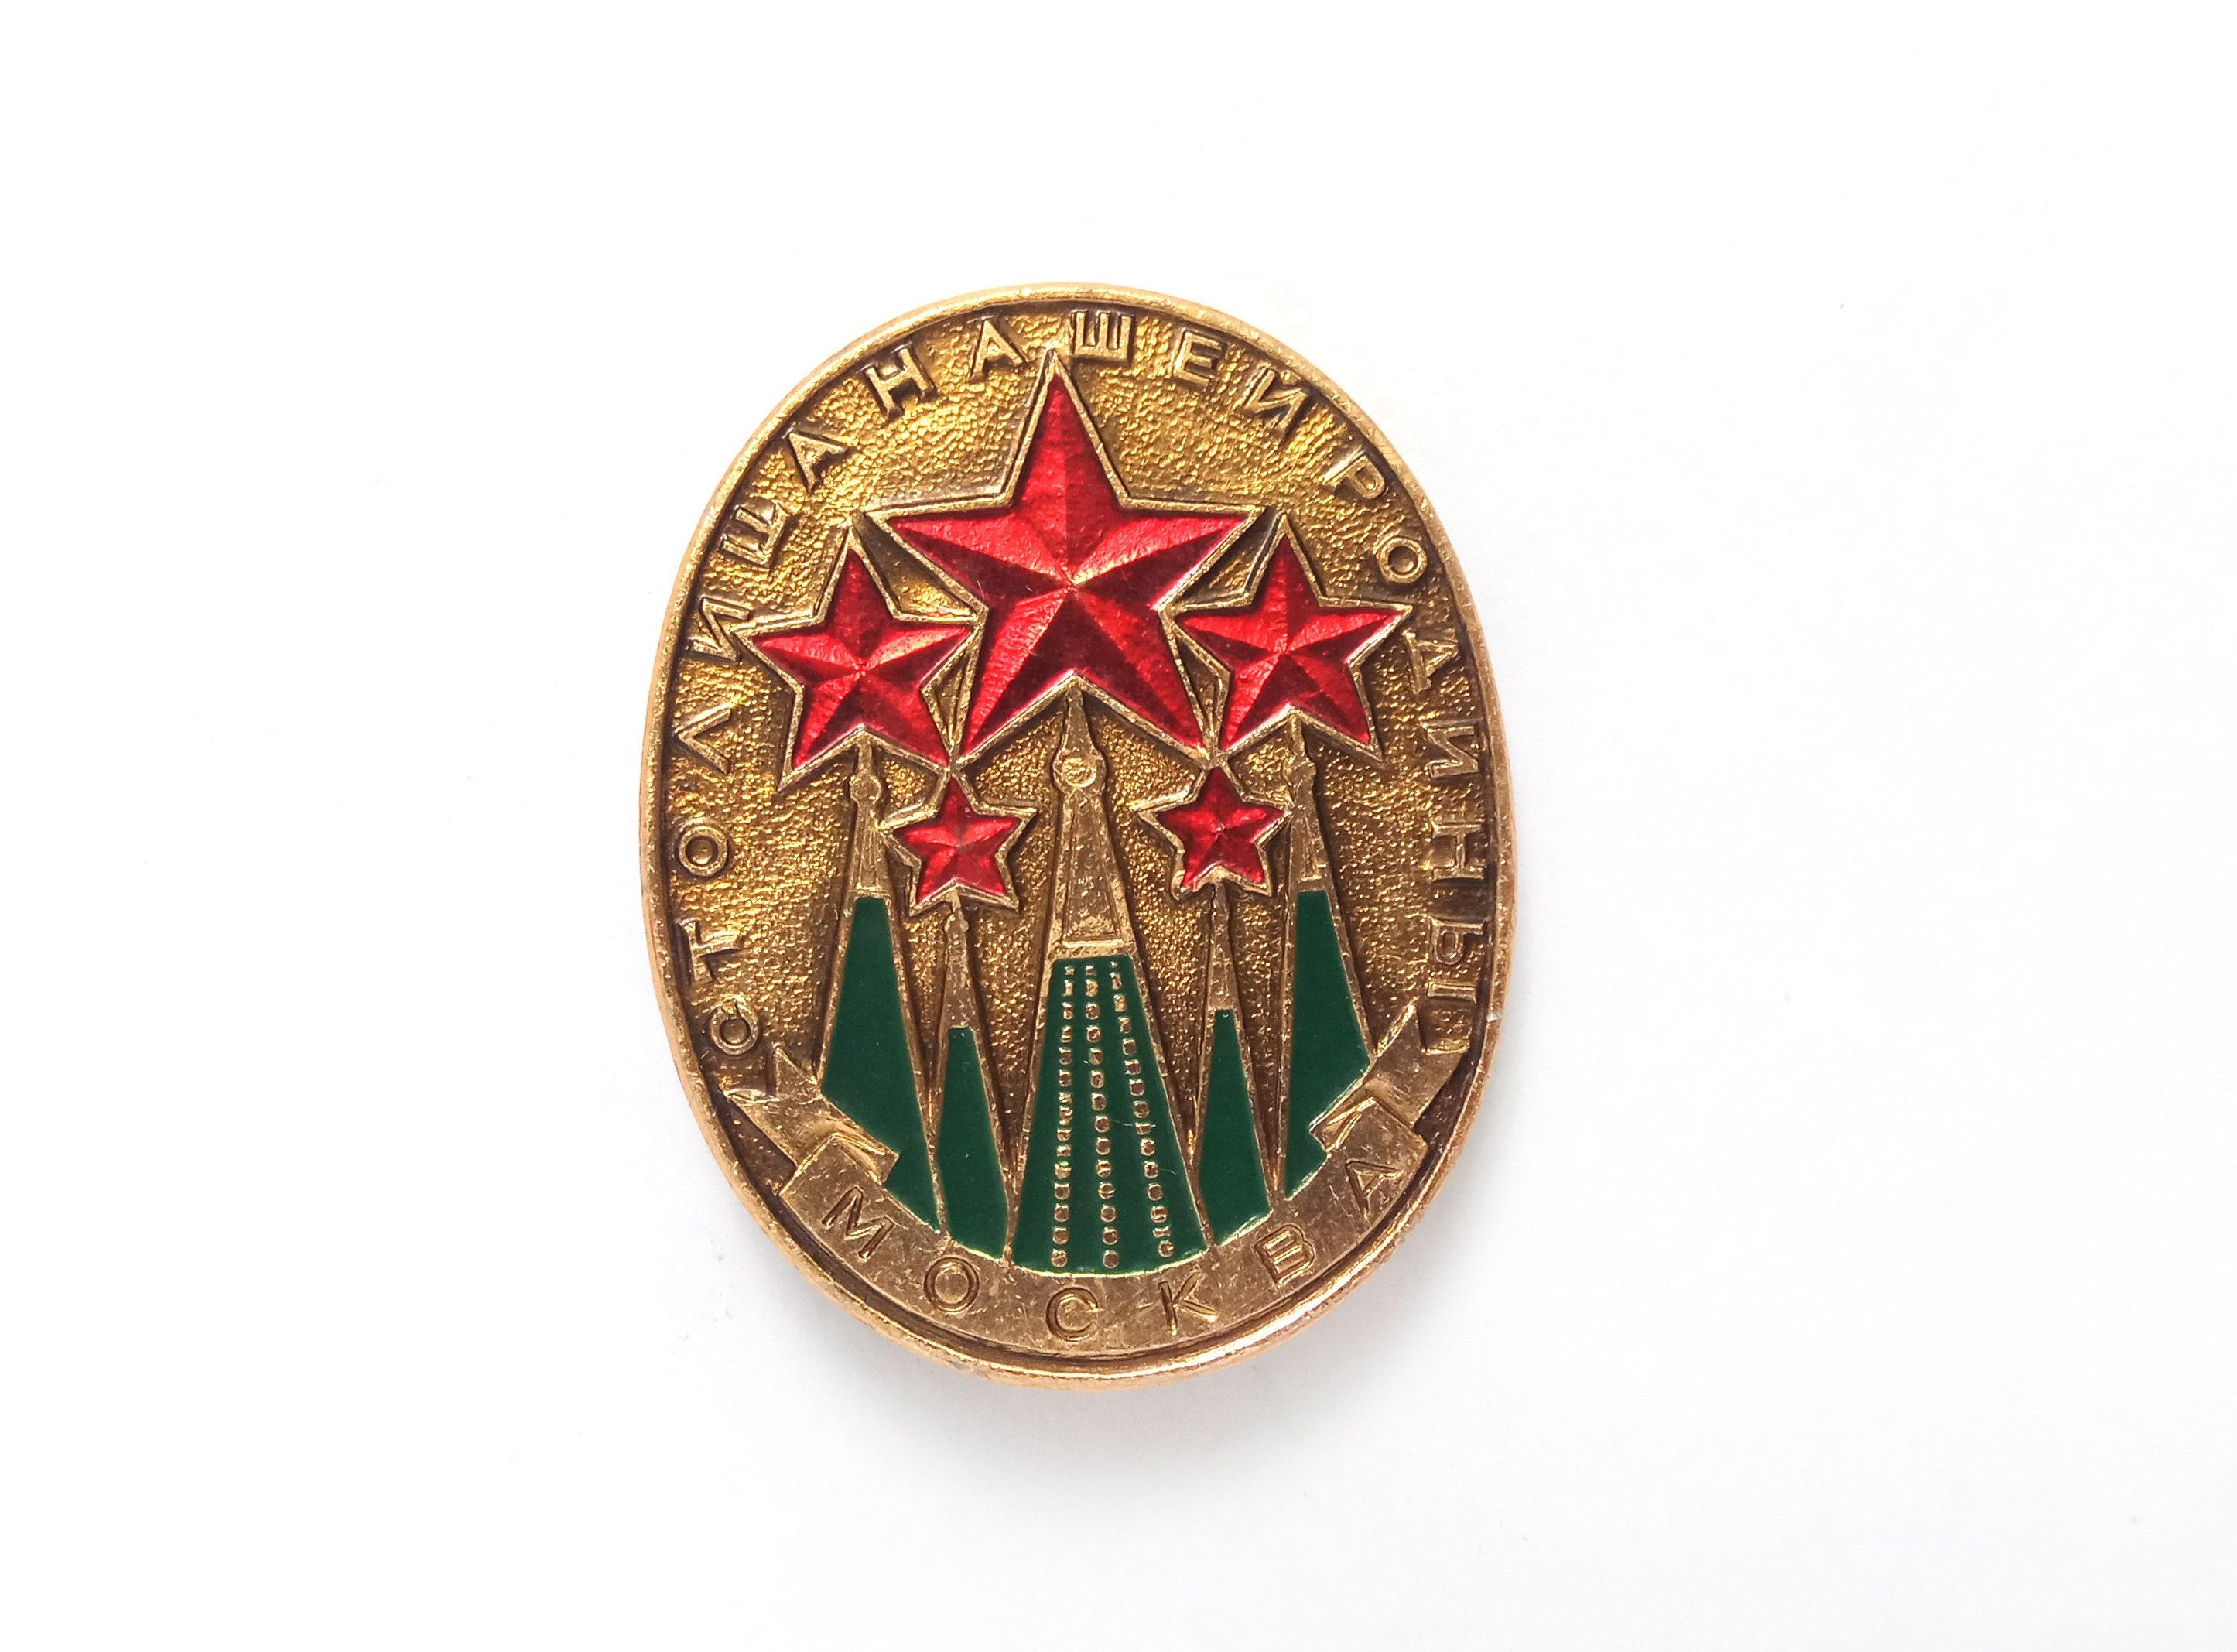 Moscow Kremlin red stars vintage enamel pin, Vintage Soviet memorabilia,  badge brooch Russia city view architecture history